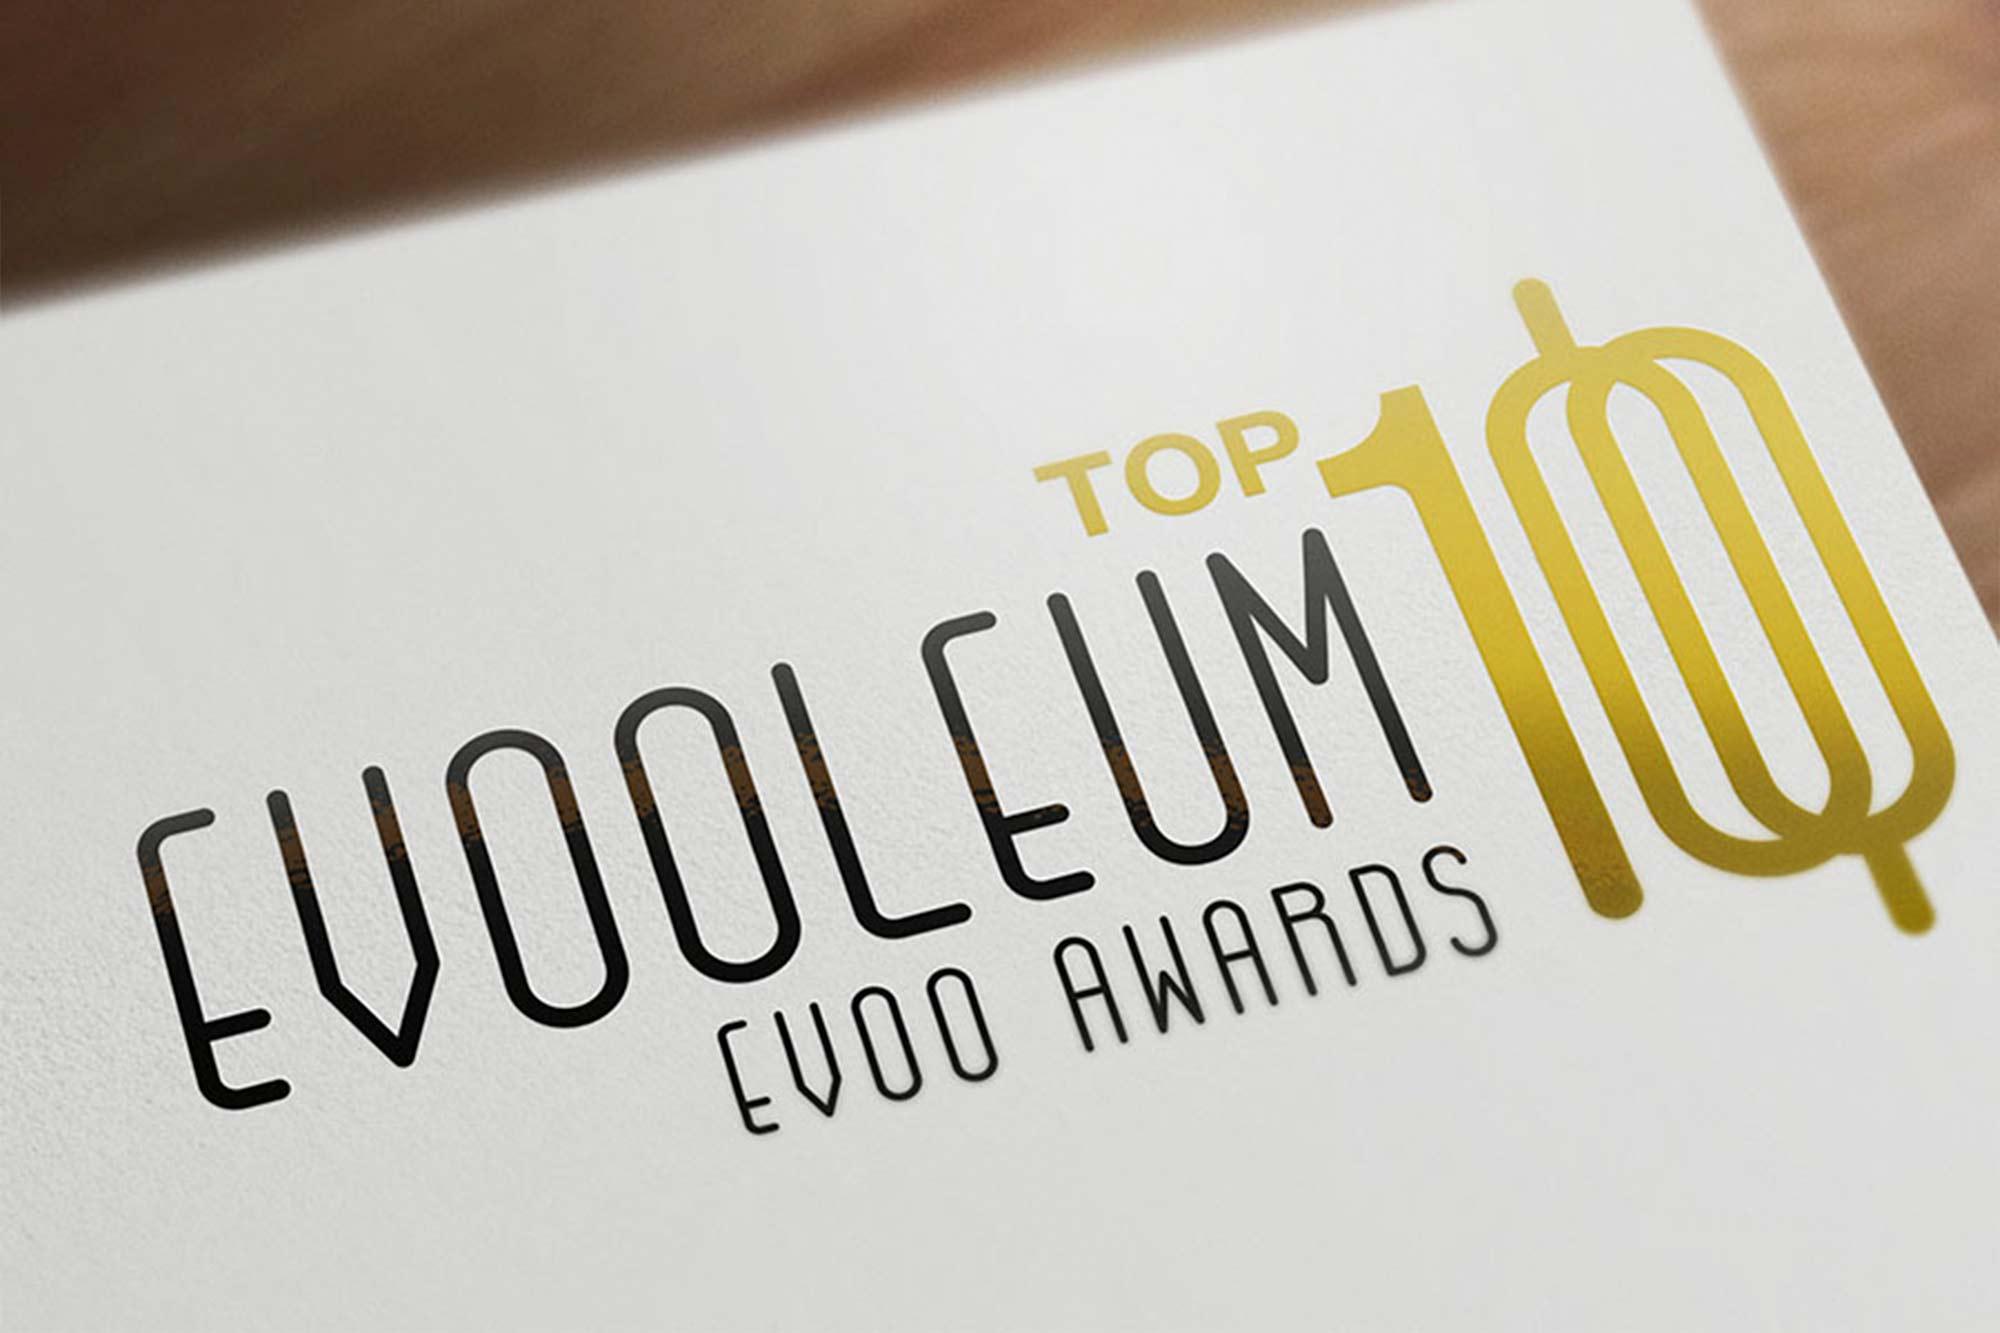 Mejores aceites del mundo según la prestigiosa Guía Evooleum - meilleures huiles d olive du monde |Torrent Closures